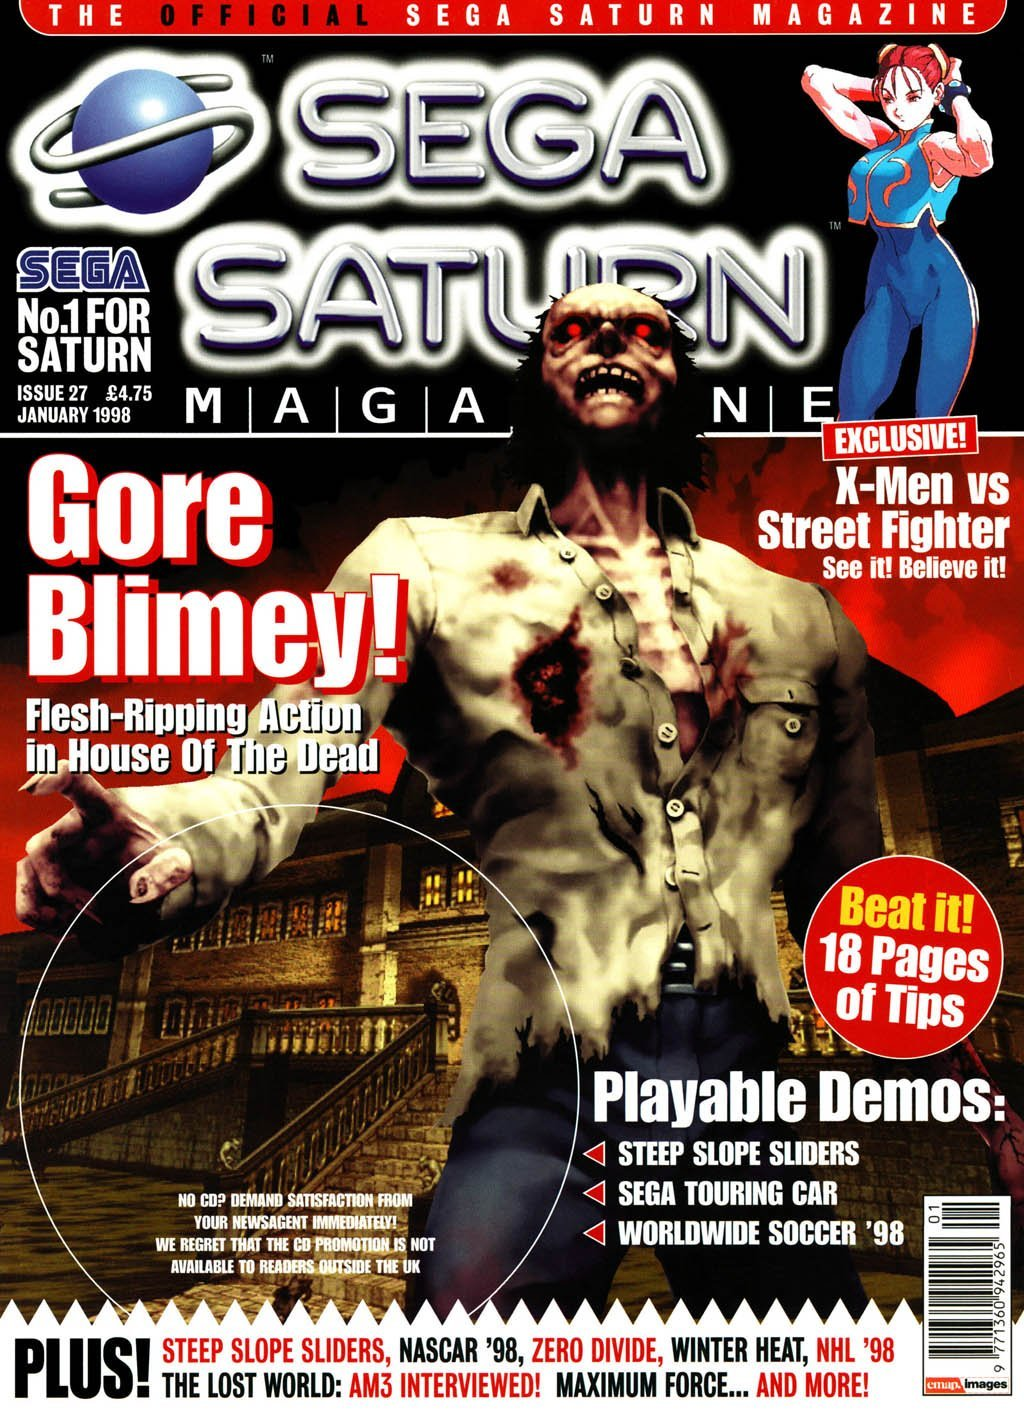 Official Sega Saturn Magazine 27 (January 1998)